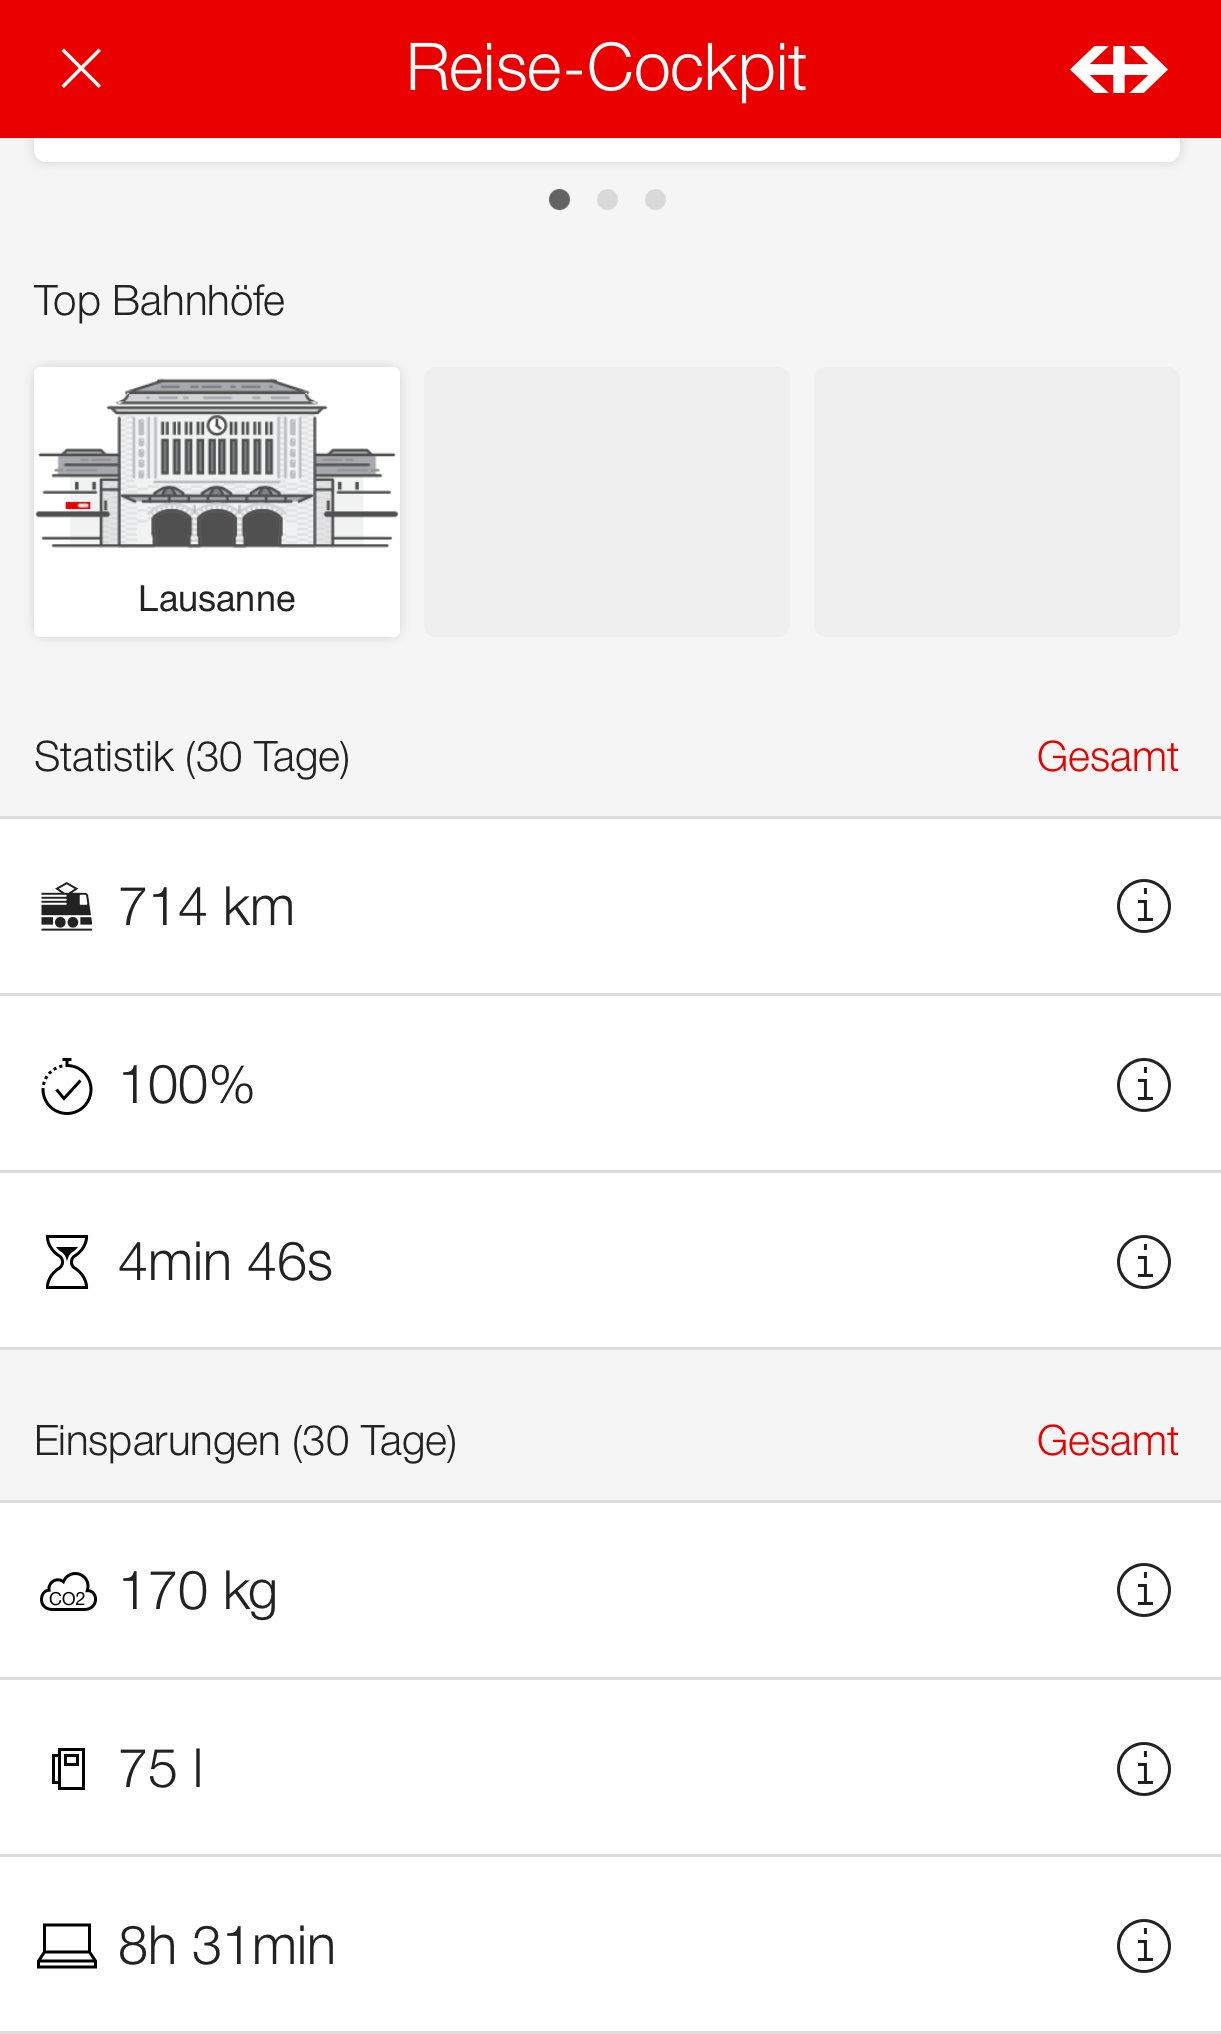 SBB Reise-Cockpit Statistik